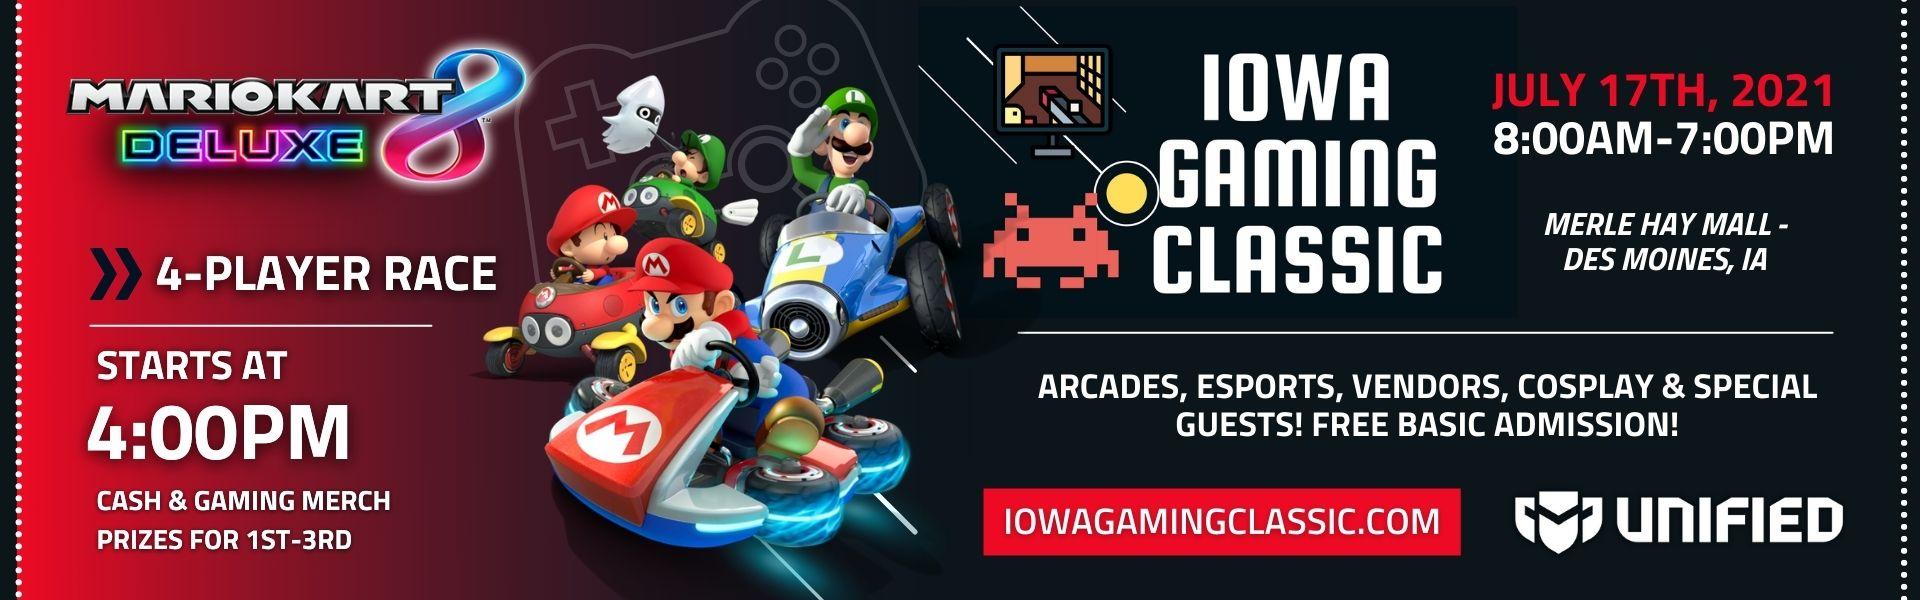 IGC: Featuring Mario Kart